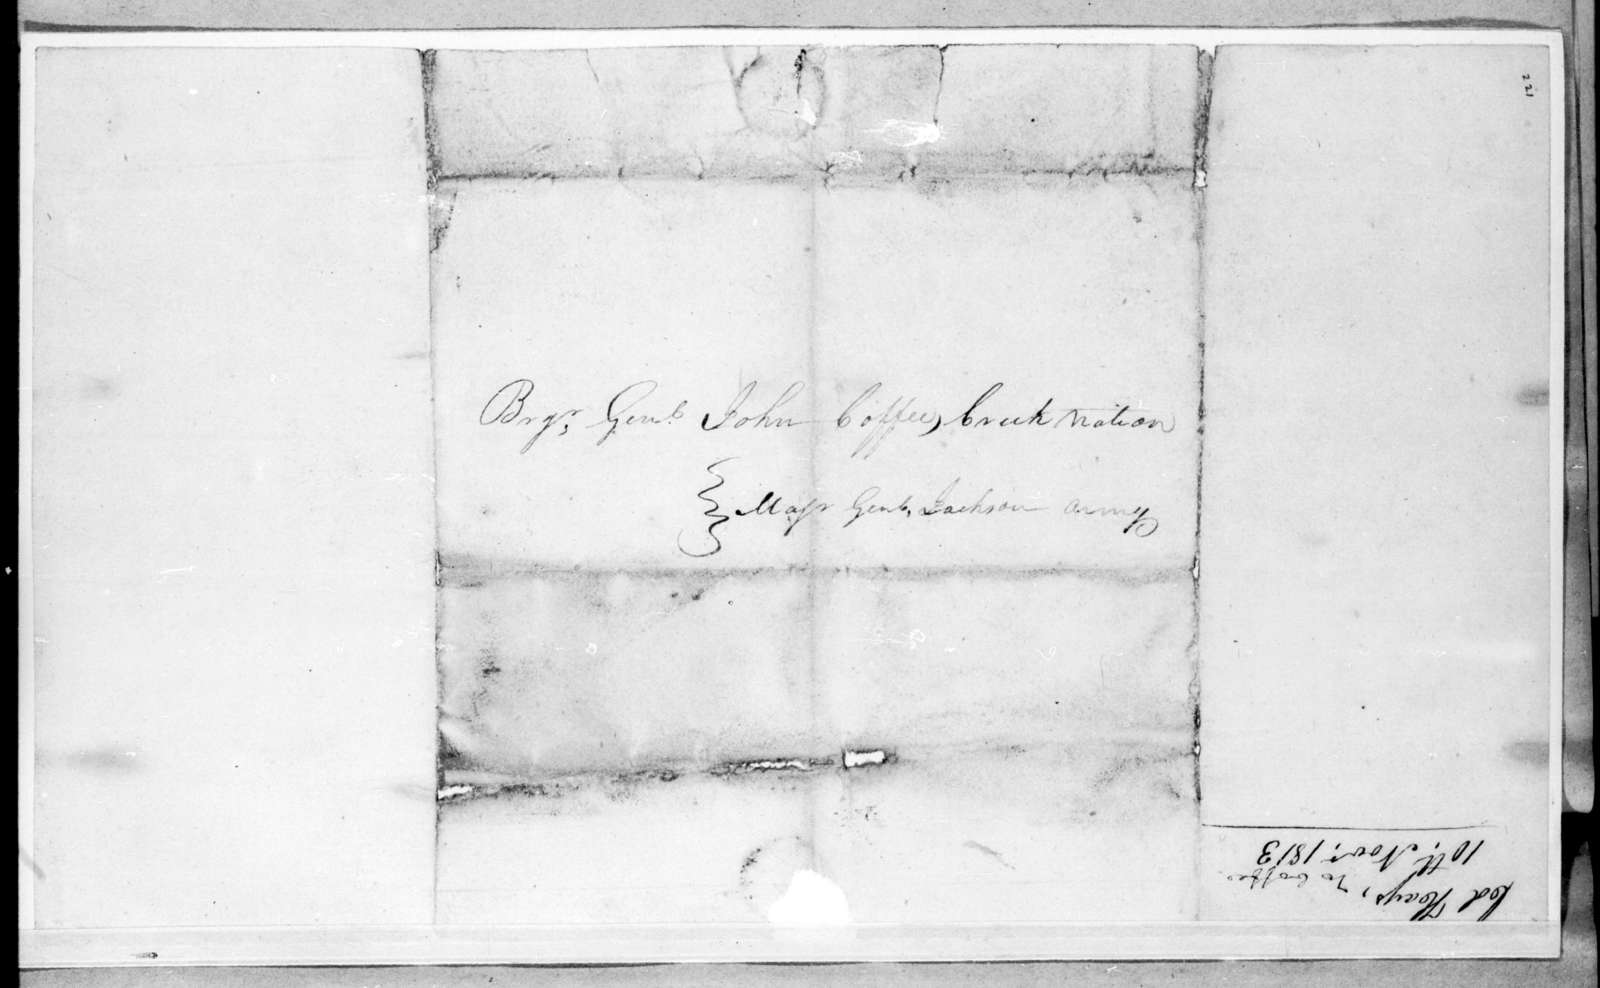 Robert Hays to John Coffee, November 12, 1813